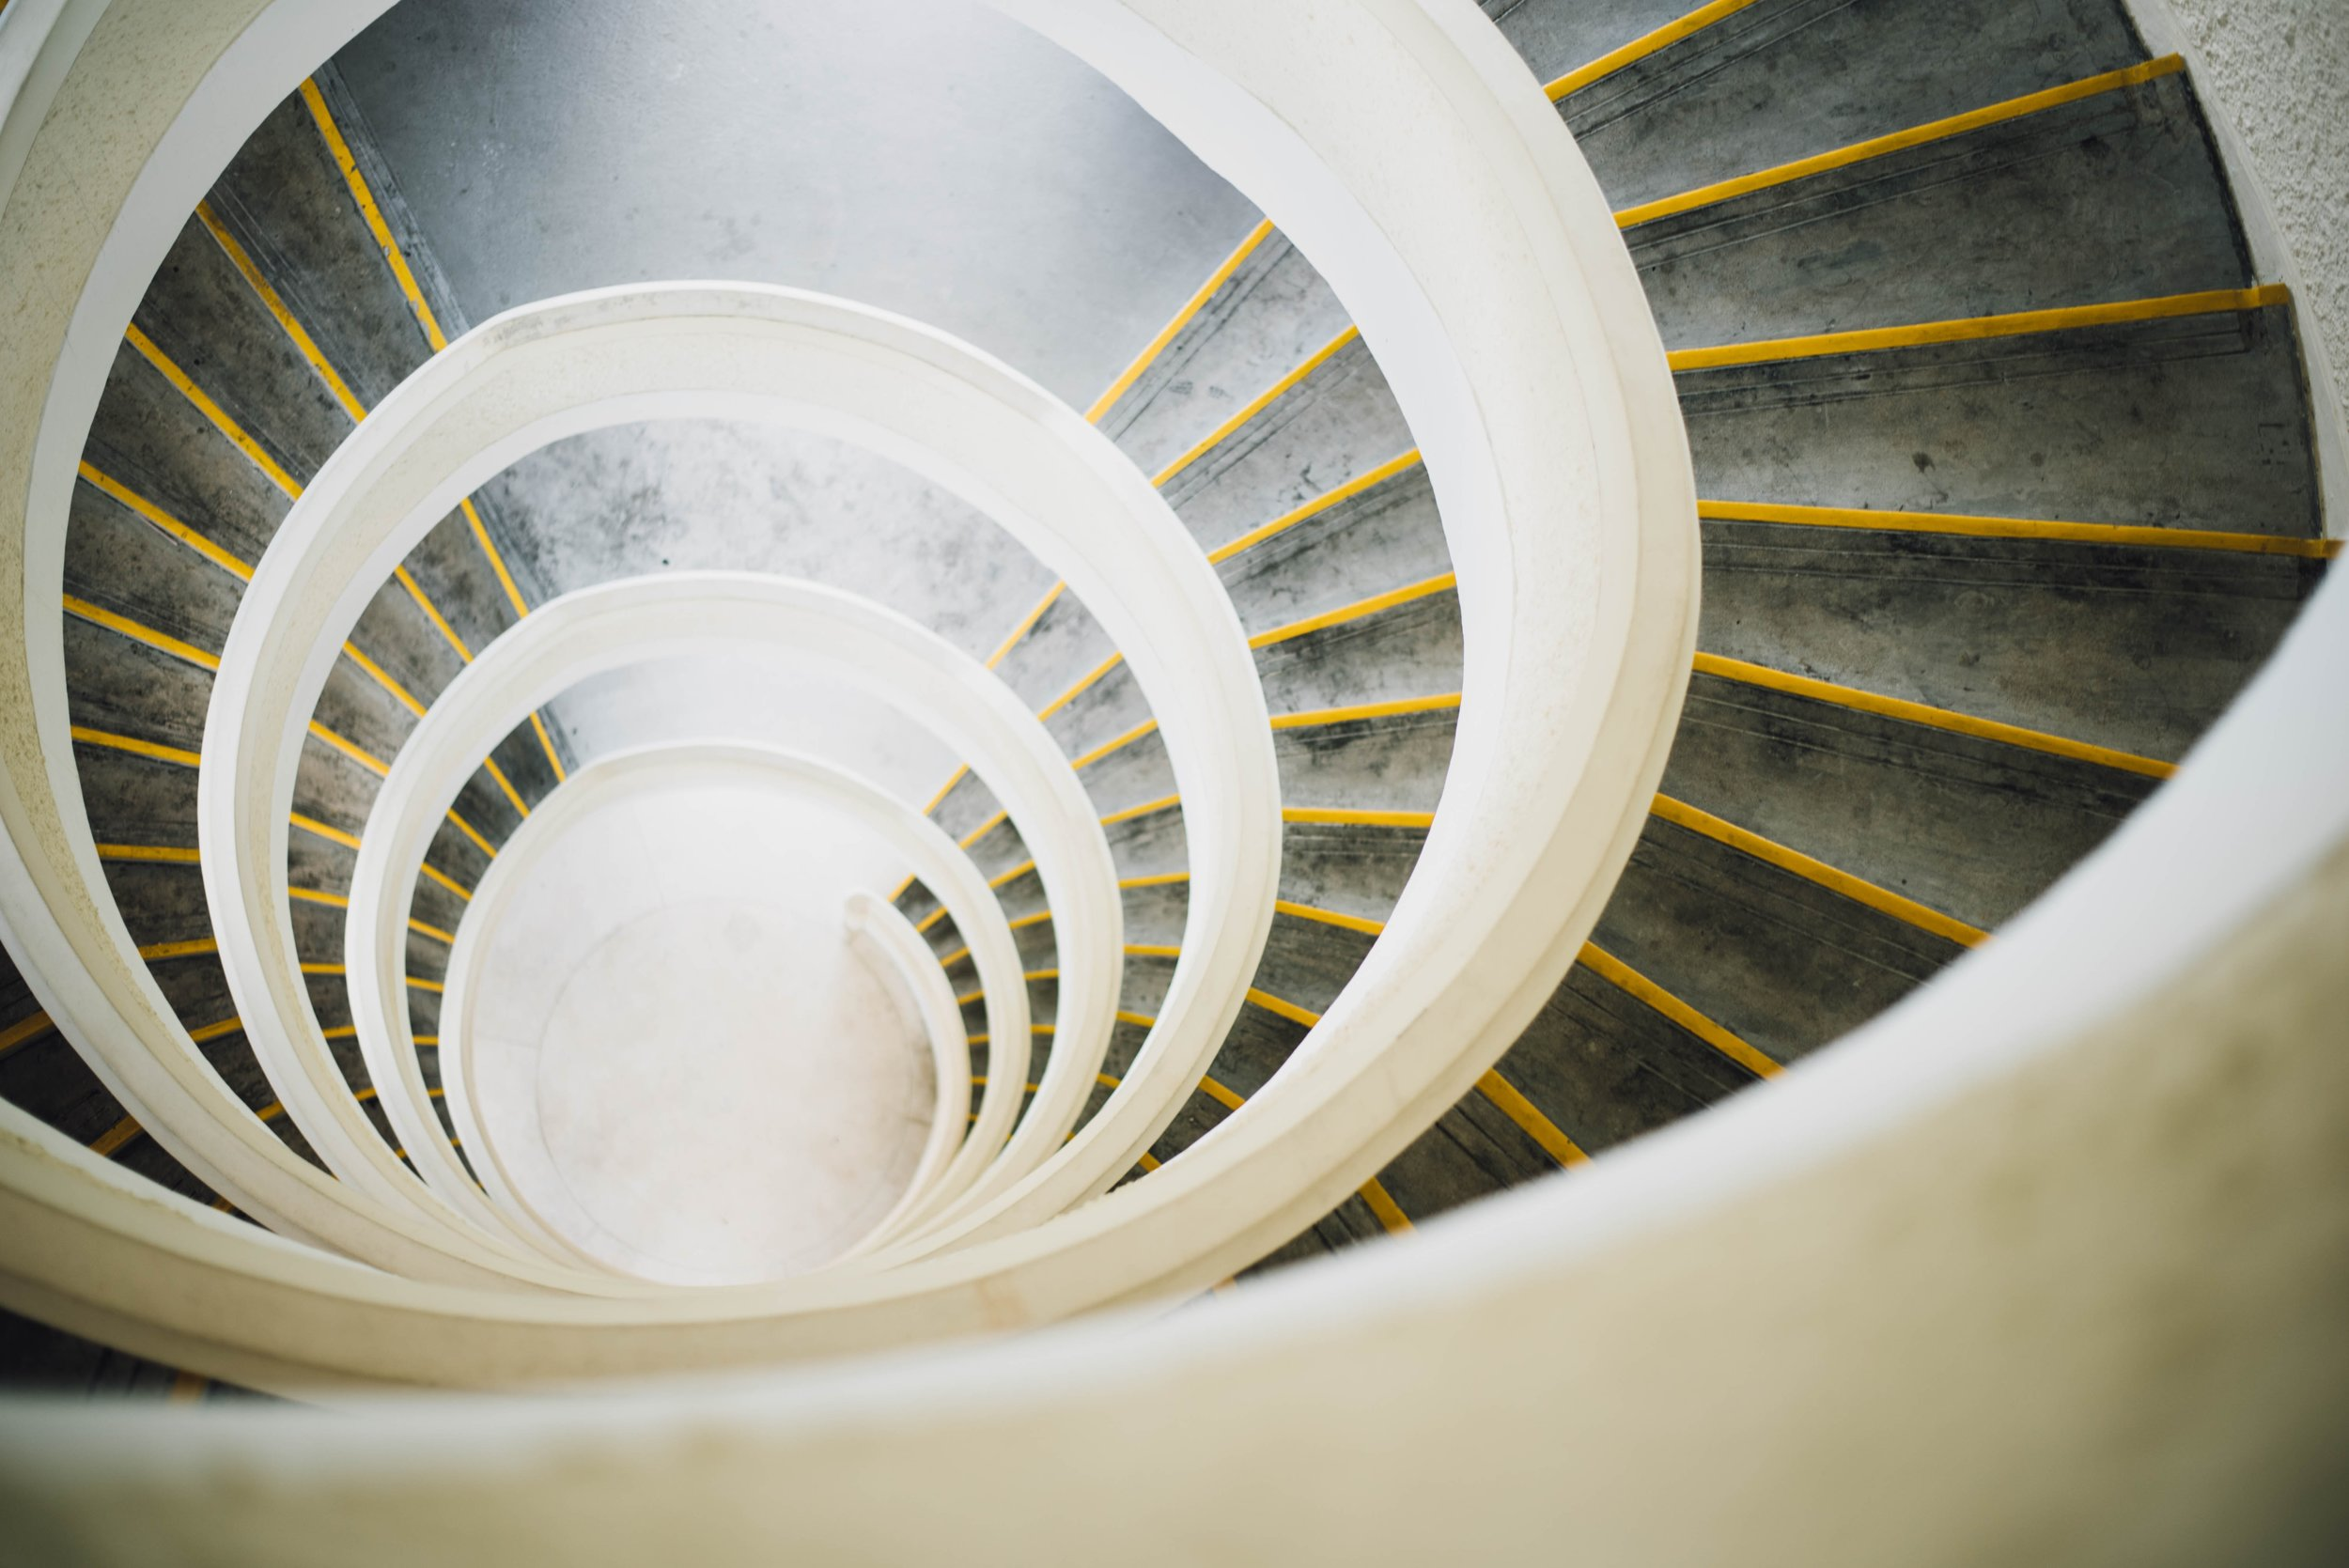 full-circle-winding-staircase-chuttersnap-179220-unsplash.jpg